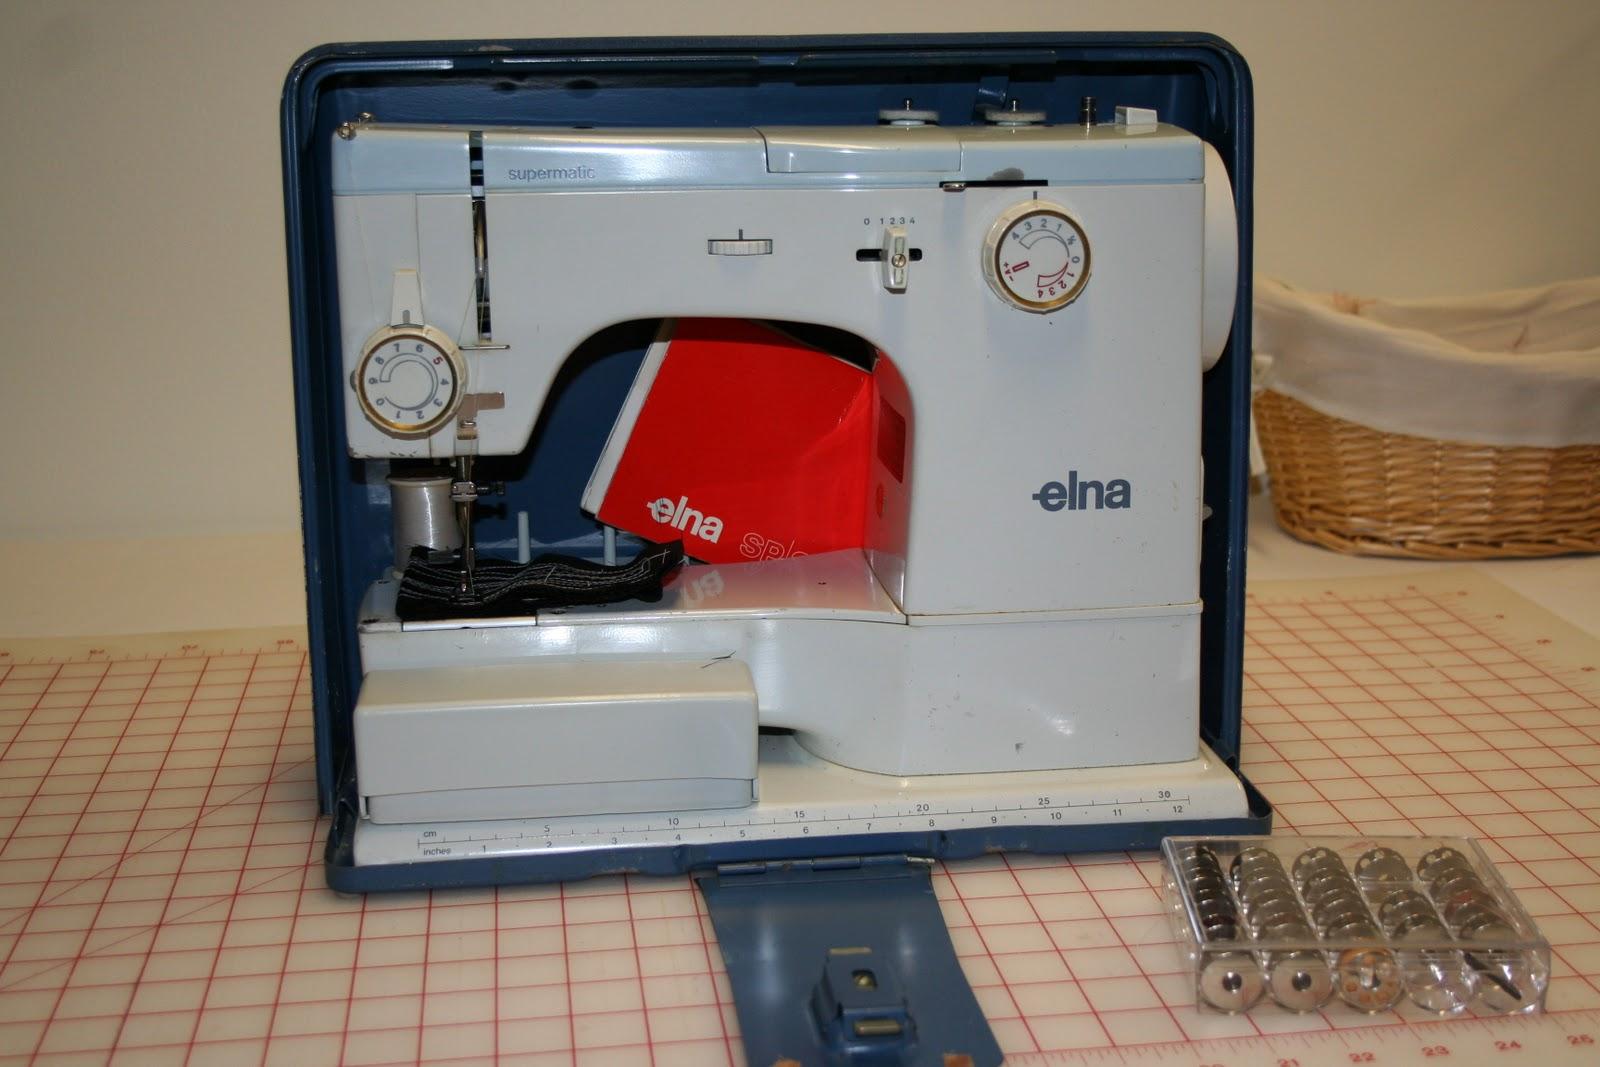 tammy s craft emporium 1970s elna supermatic sewing machine ella rh tammyscraftemporium blogspot com Elna Super Sewing Machine Manual Elna Super Sewing Machine Manual